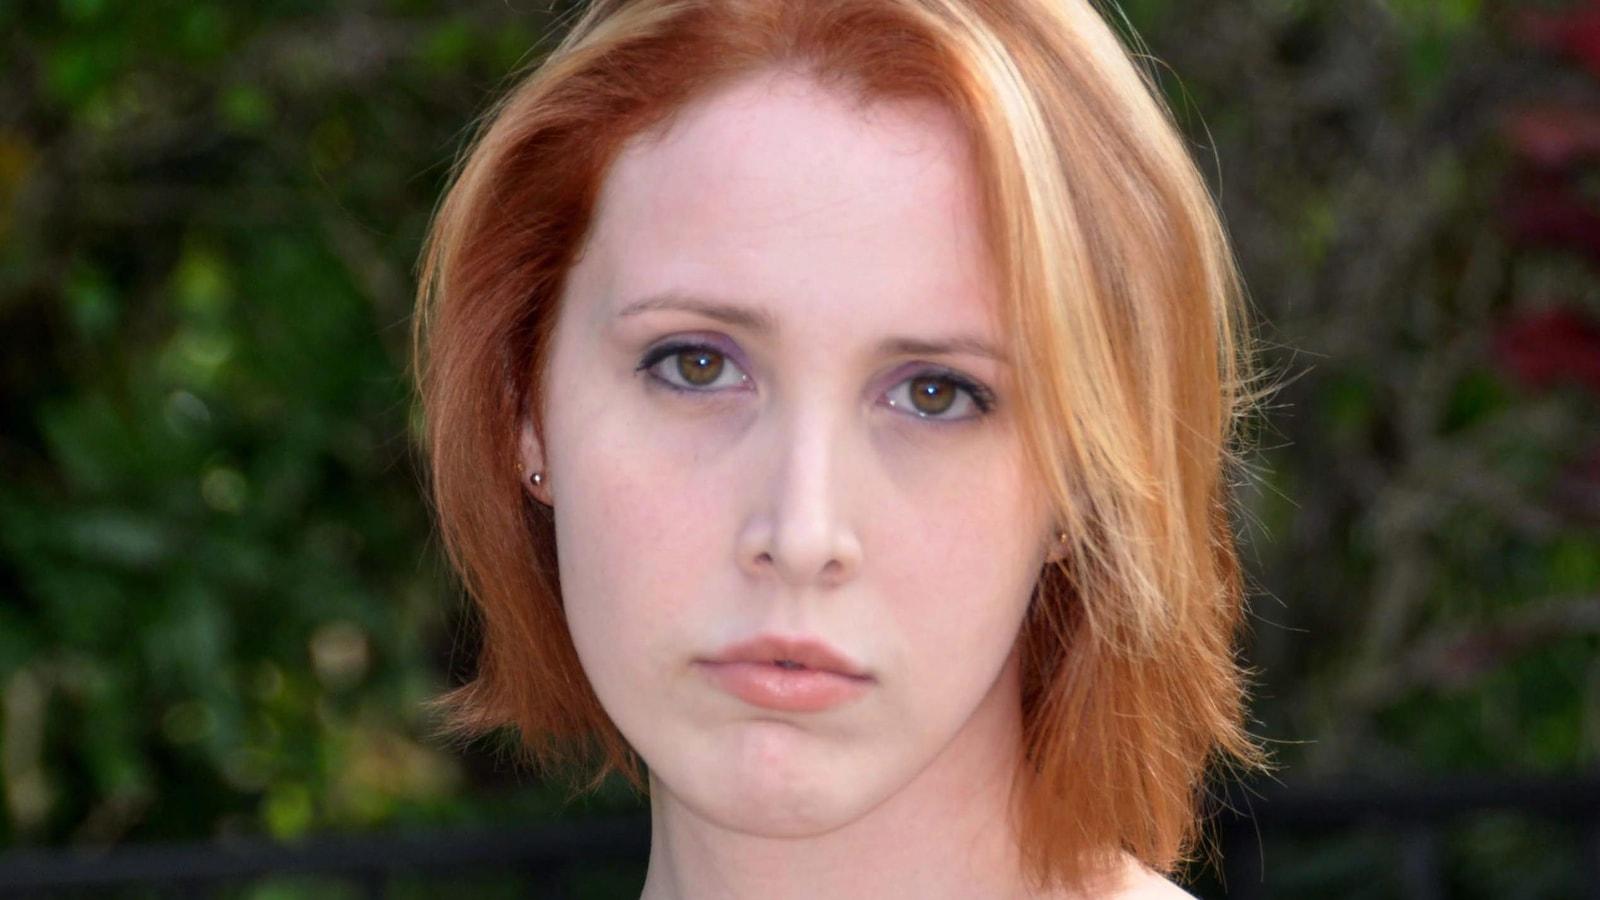 Dylan Farrow, fille adoptive de Mia Farrow et de Woody Allen